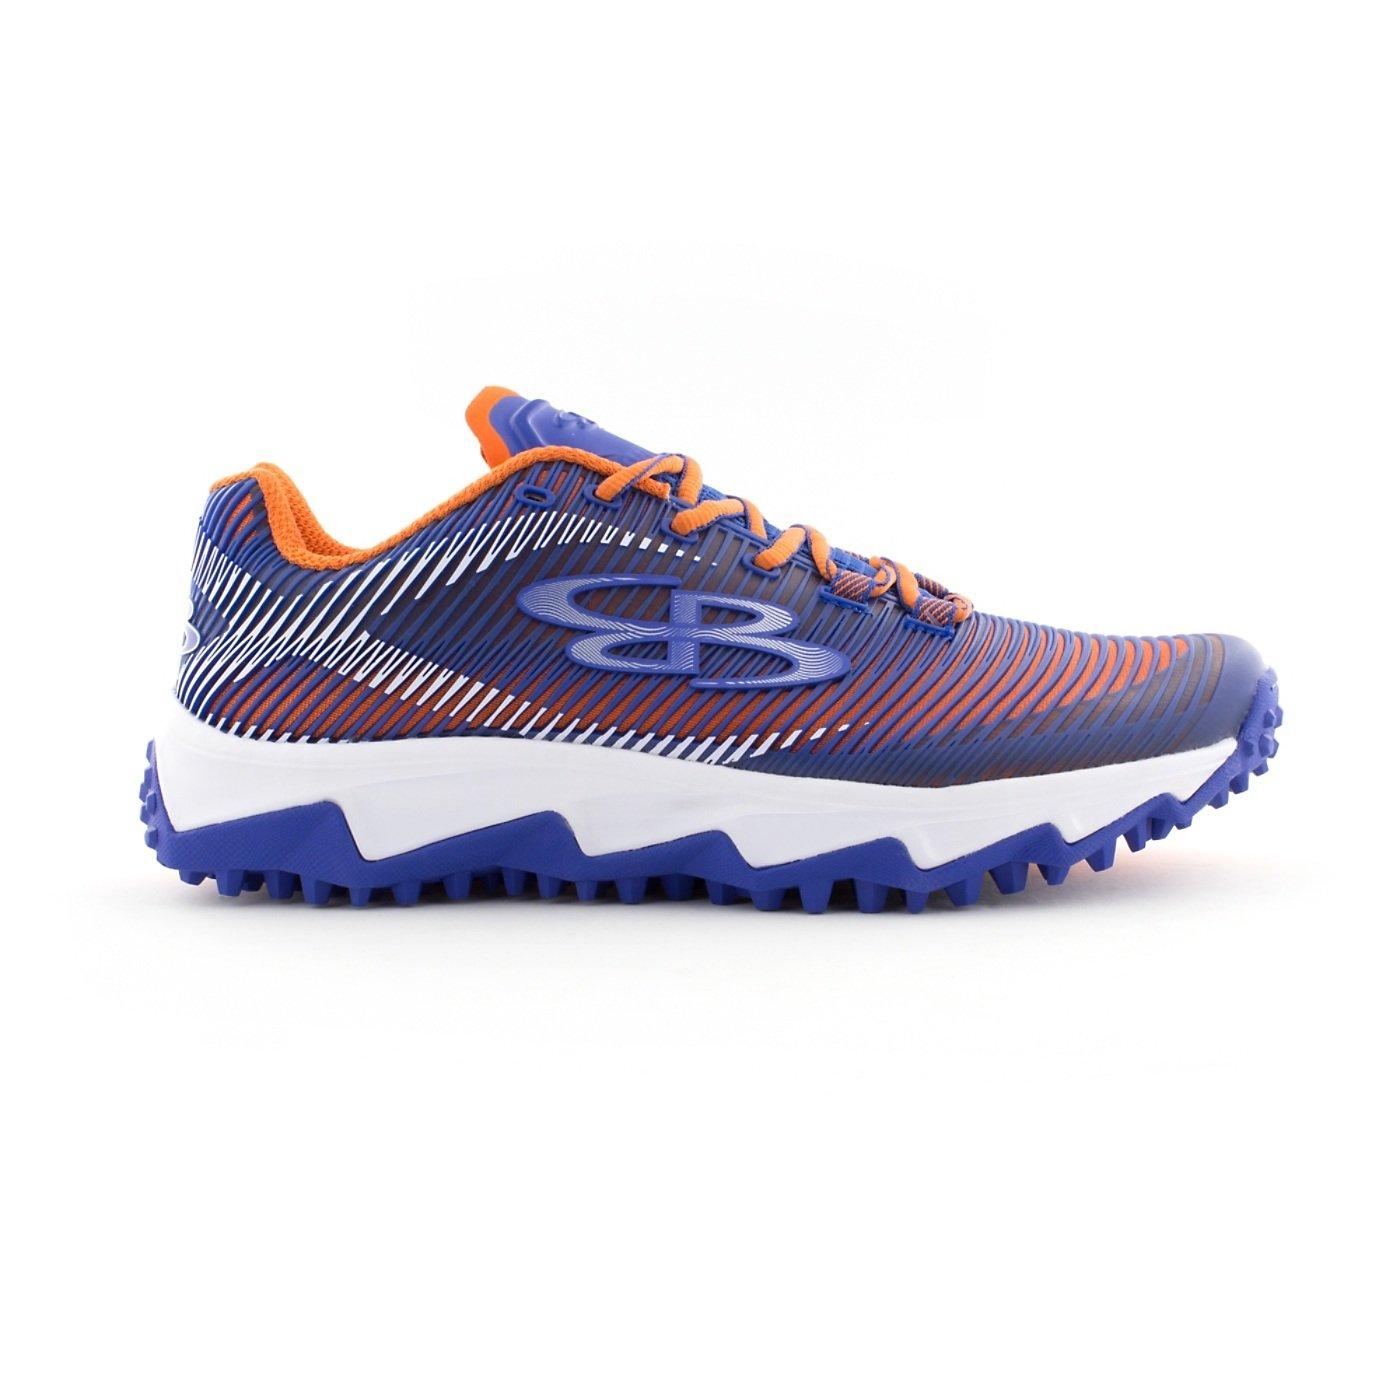 Boombah Men's Aftershock DPS Turf Shoes - 18 Color Options - Multiple Sizes B0767Q5R5Y 13 Royal/Orange